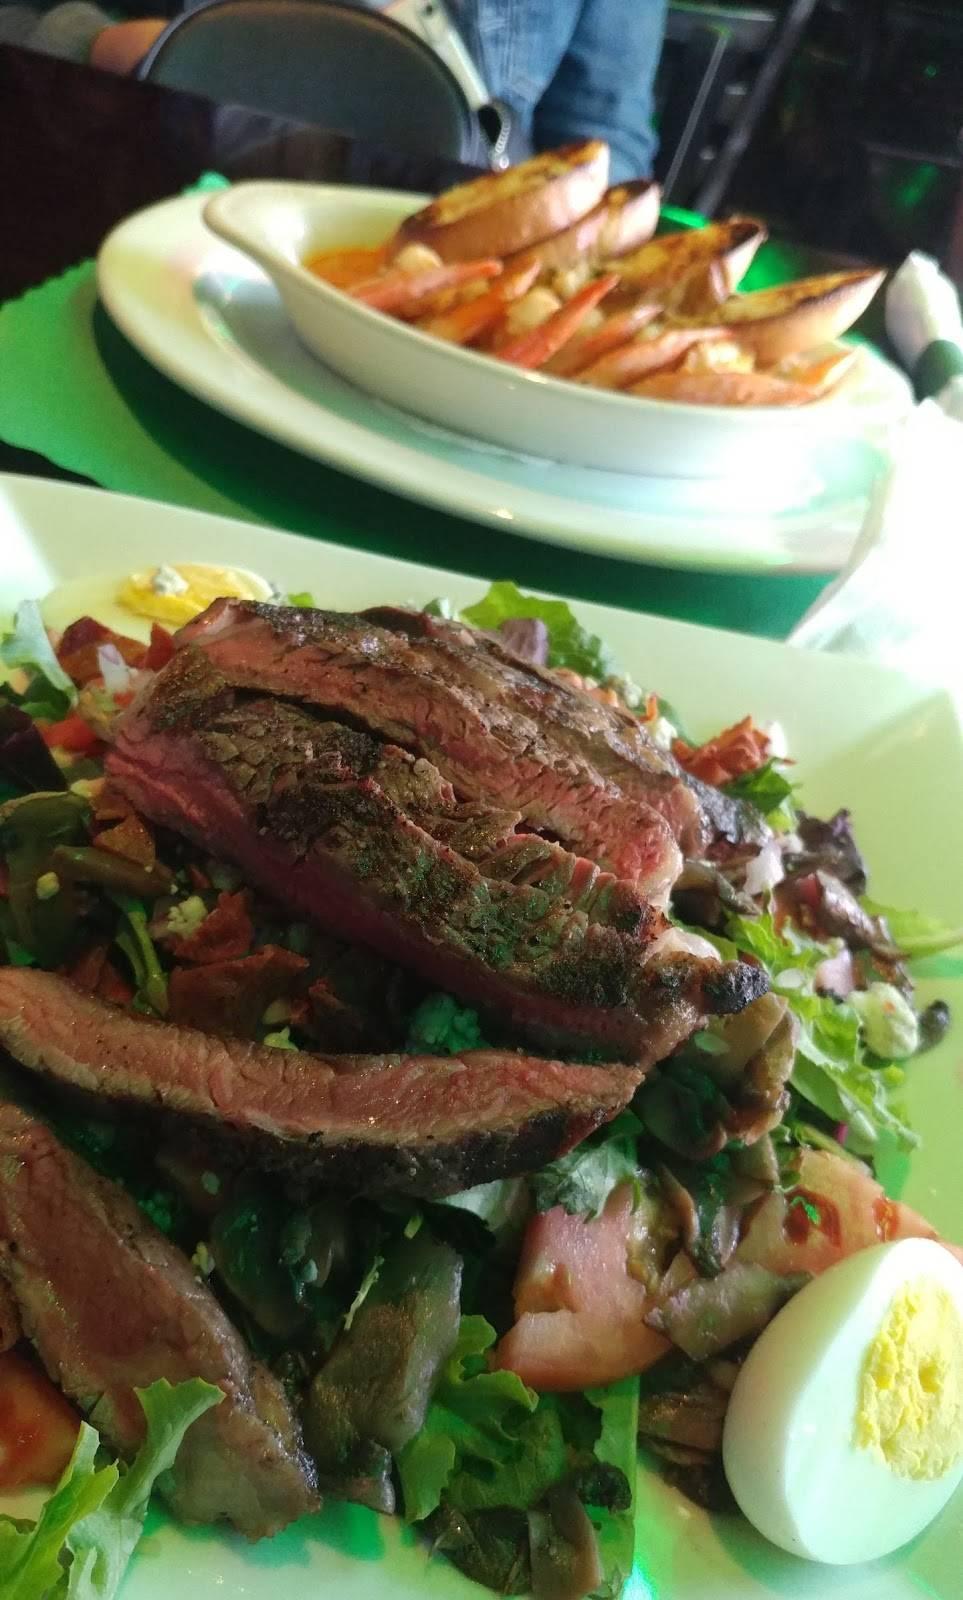 Blackjack Mulligans Public House   restaurant   279 Passaic St, Garfield, NJ 07026, USA   8622387578 OR +1 862-238-7578